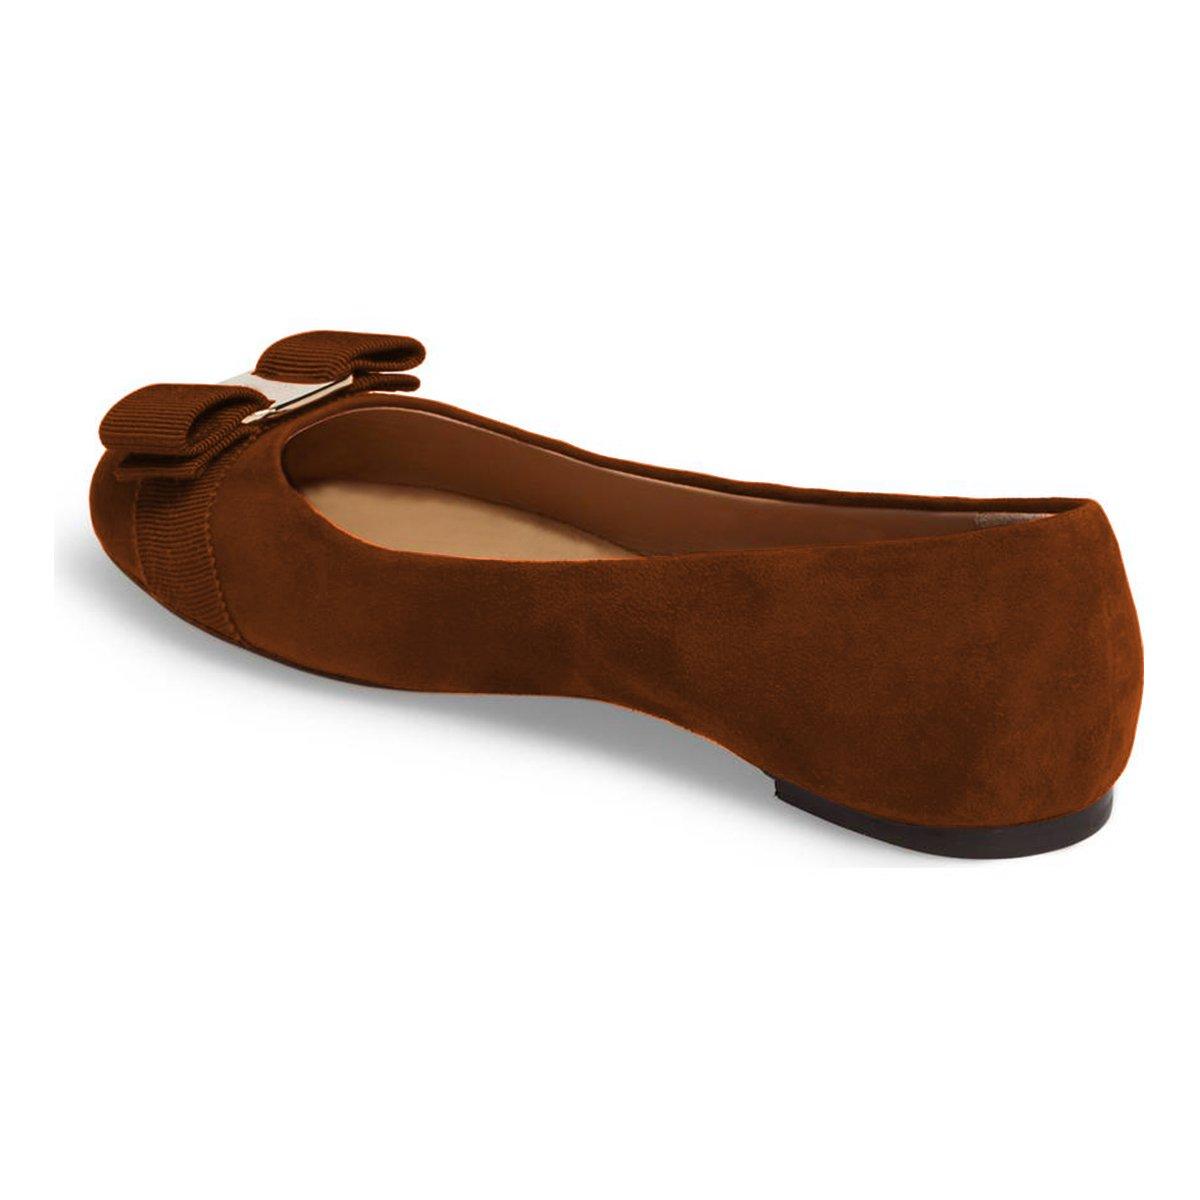 FSJ Women Cute Bowknot Round Toe Ballet Flats Slip On Casual Office Comfy Pumps Shoes Size 4-15 US B077PF19TS 11 B(M) US|Brown